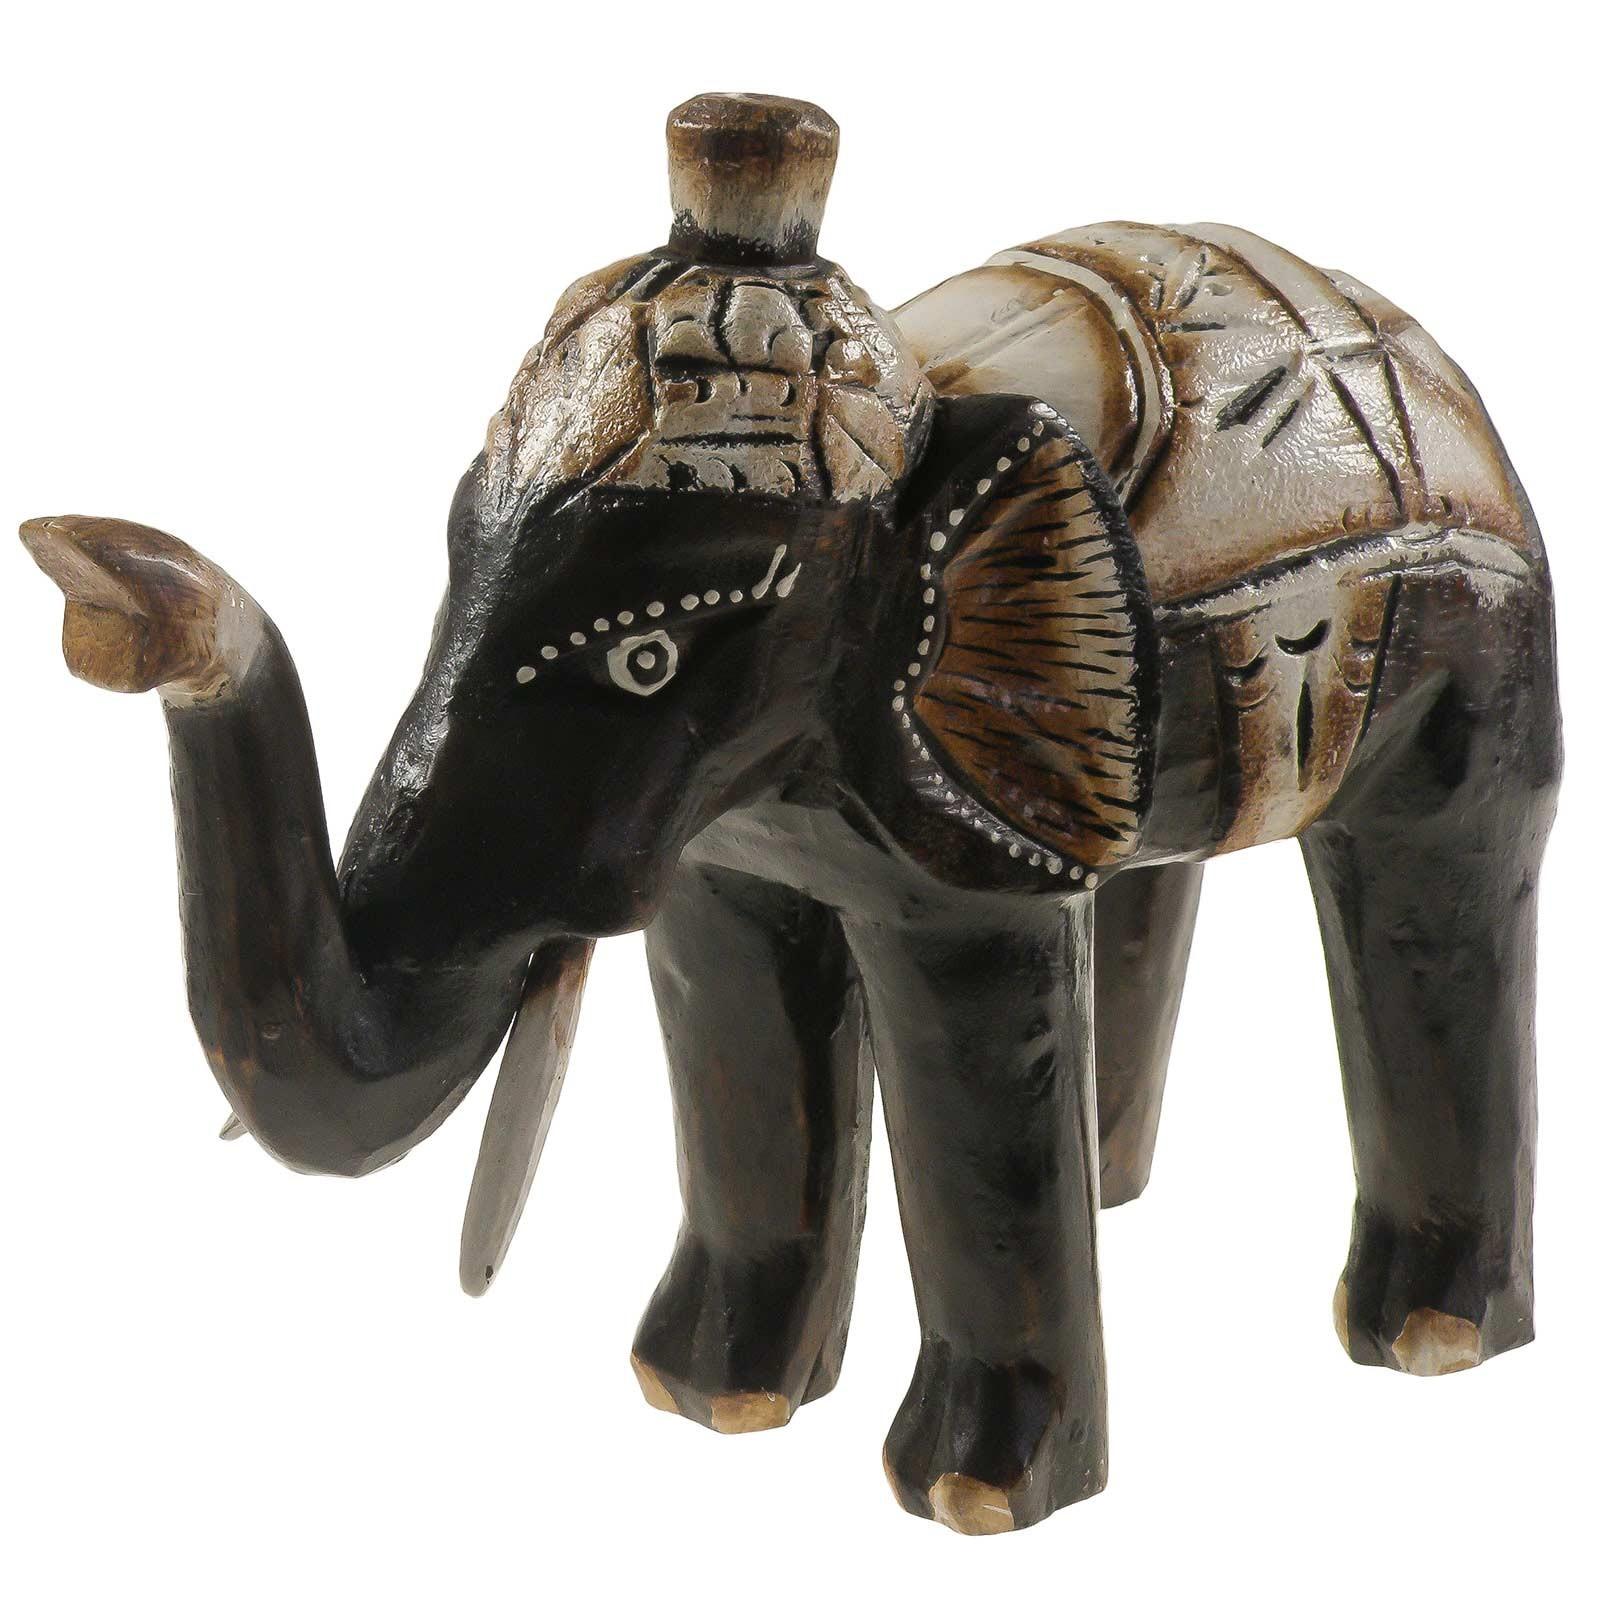 1 Elefant SABI aus Albesia-Holz, Deko-Elefant, ca. 20 cm – Bild 2